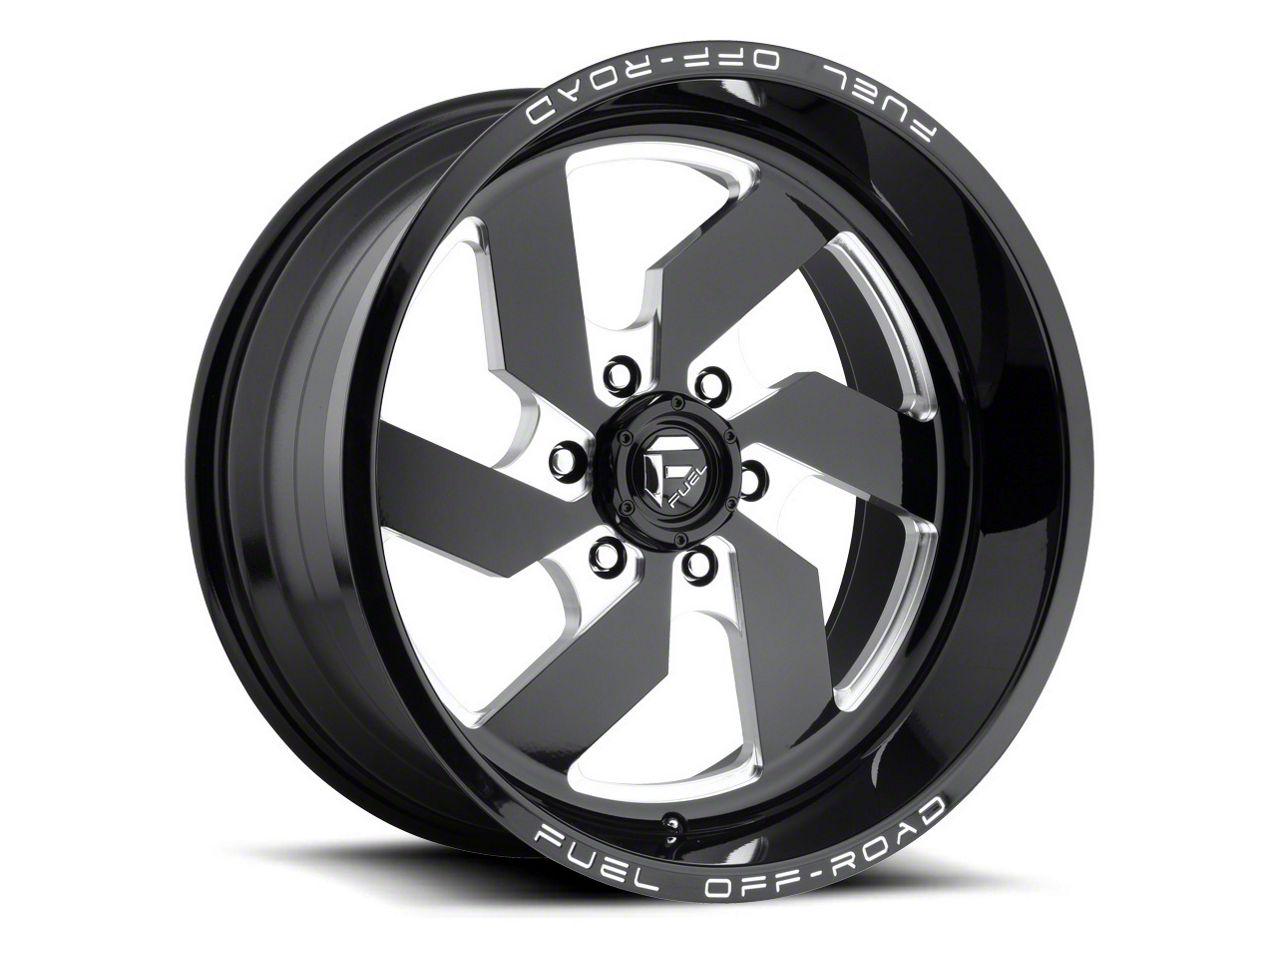 Fuel Wheels Turbo Black Milled 6-Lug Wheel - 20x10 (04-18 F-150)